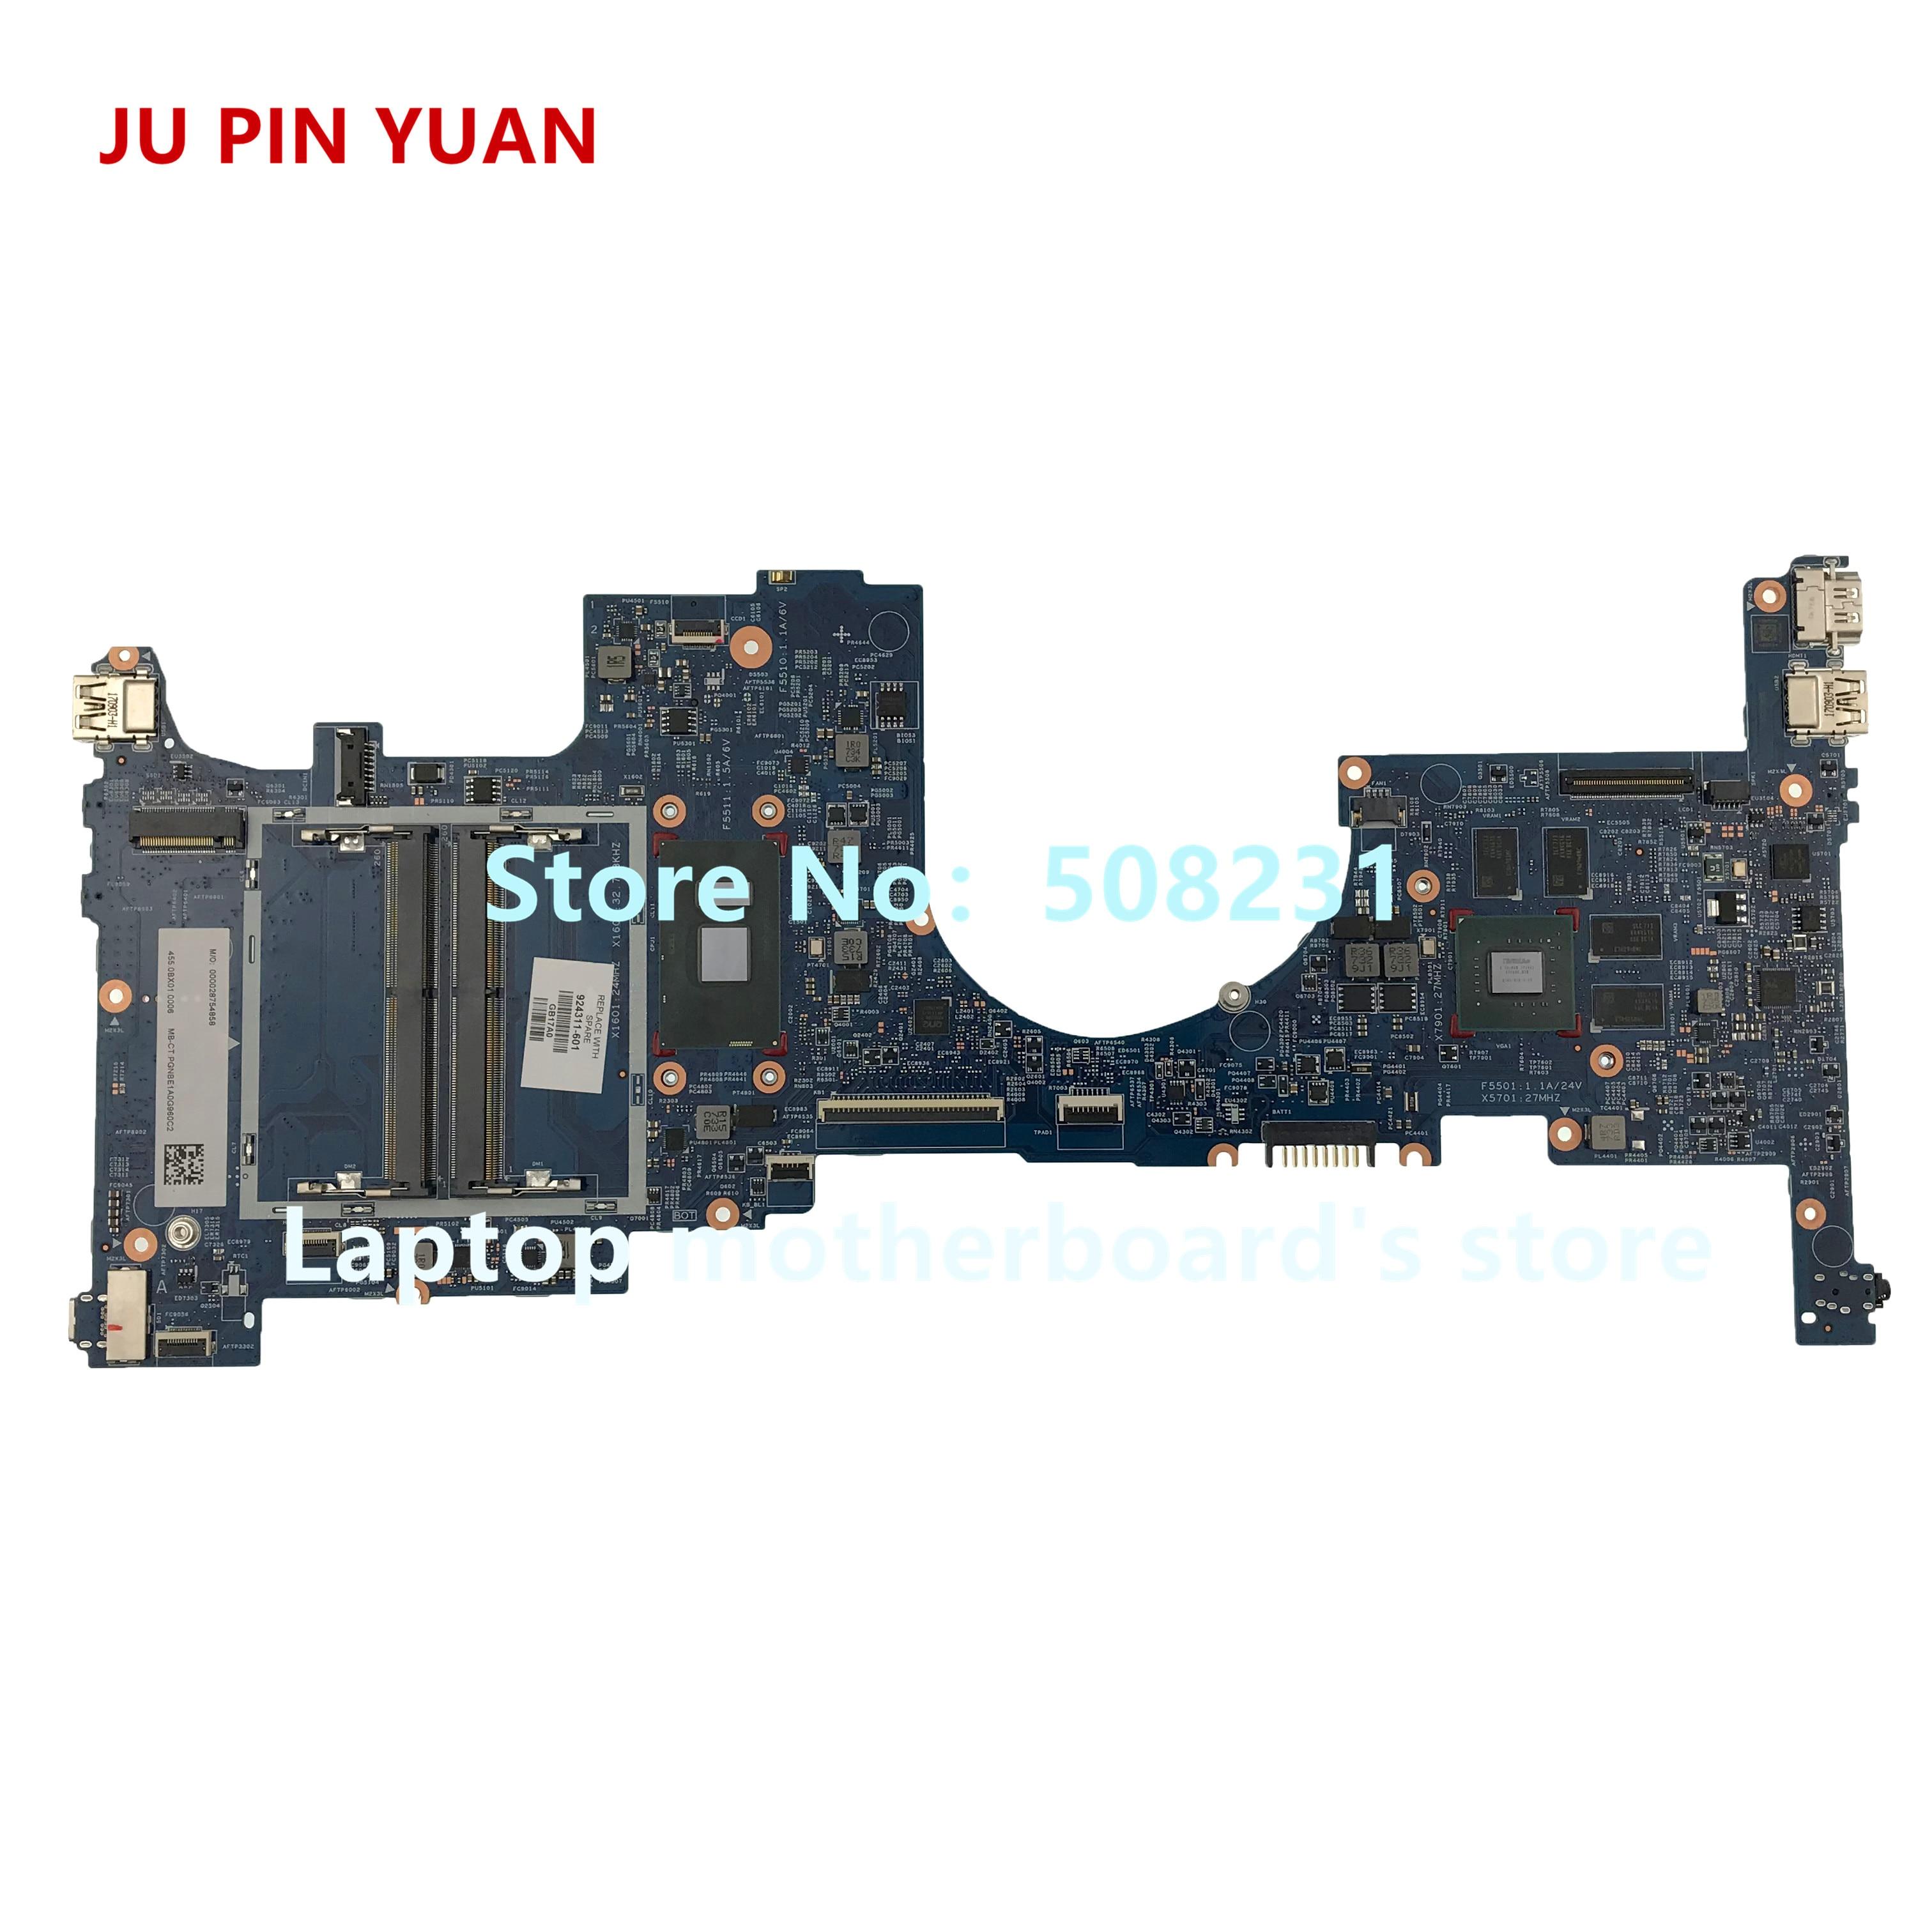 JU PIN YUAN 924311 601 448.0BX06.0011 motherboard For HP ENVY X360 CONVERTIBLE 15 BP Notebook PC 940MX 4GB i7 7500U fully Tested